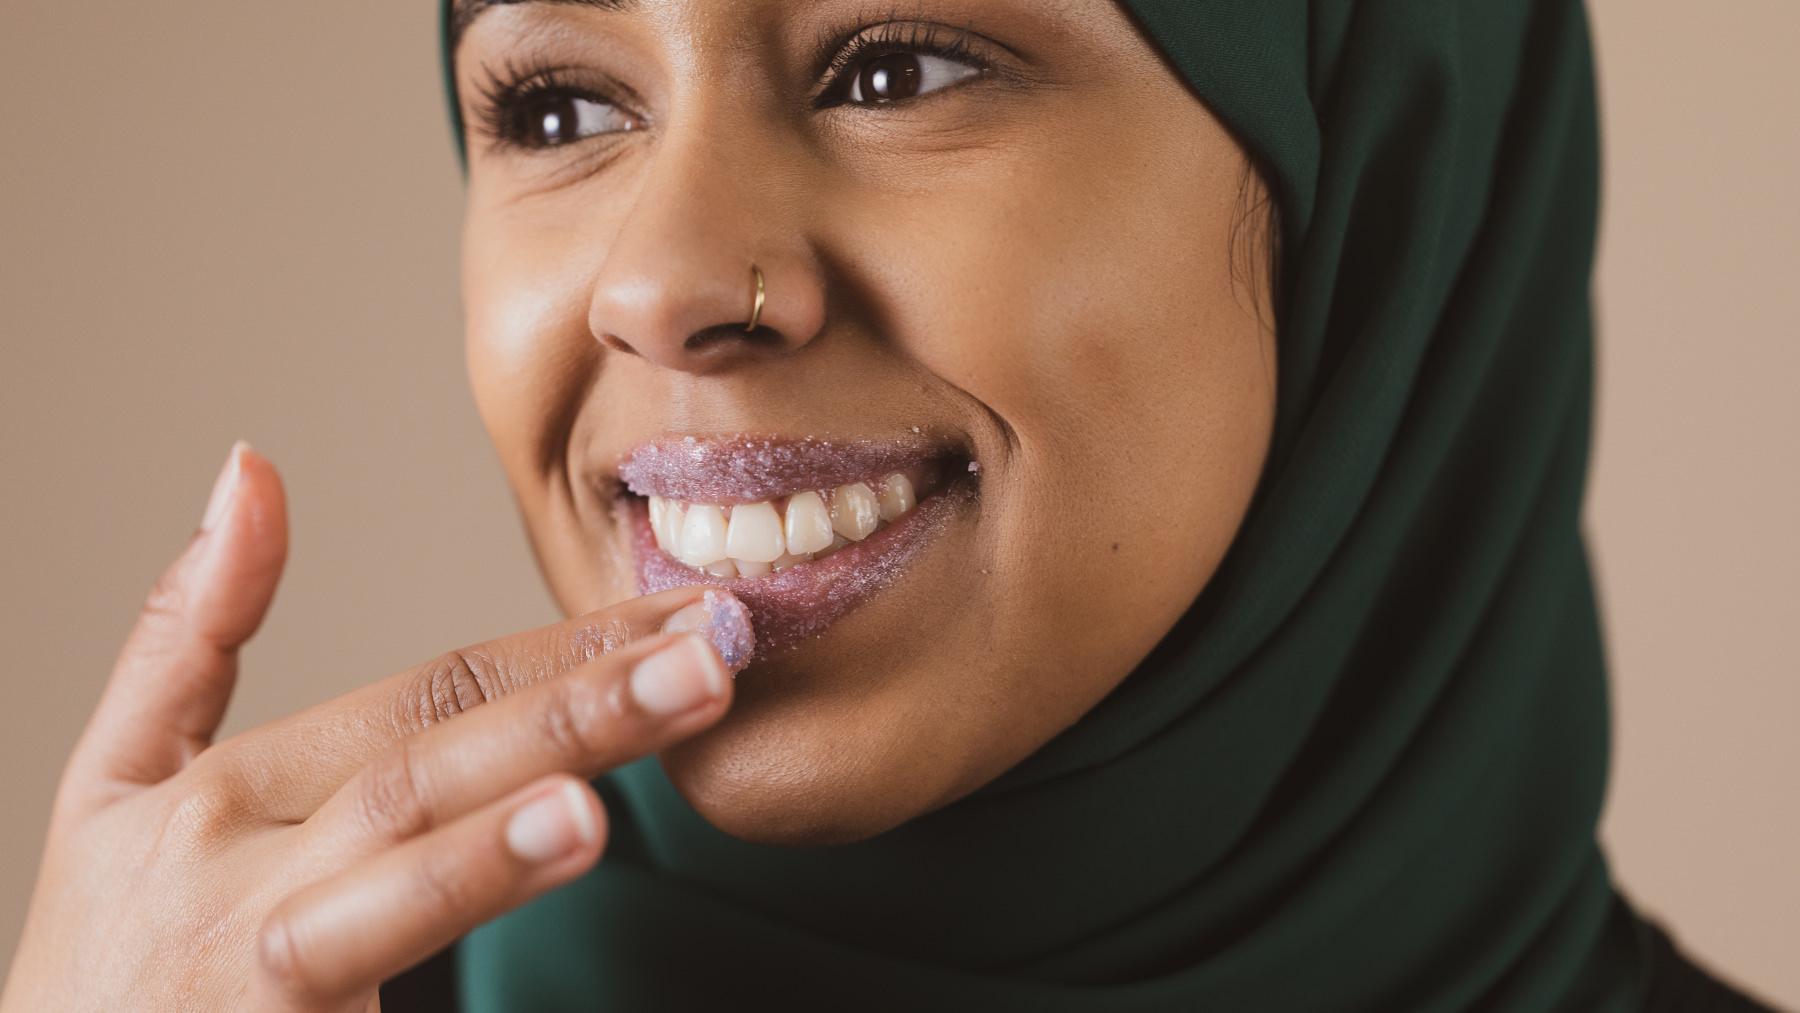 A person applying a purple sugar lip scrub to their lips while smiling